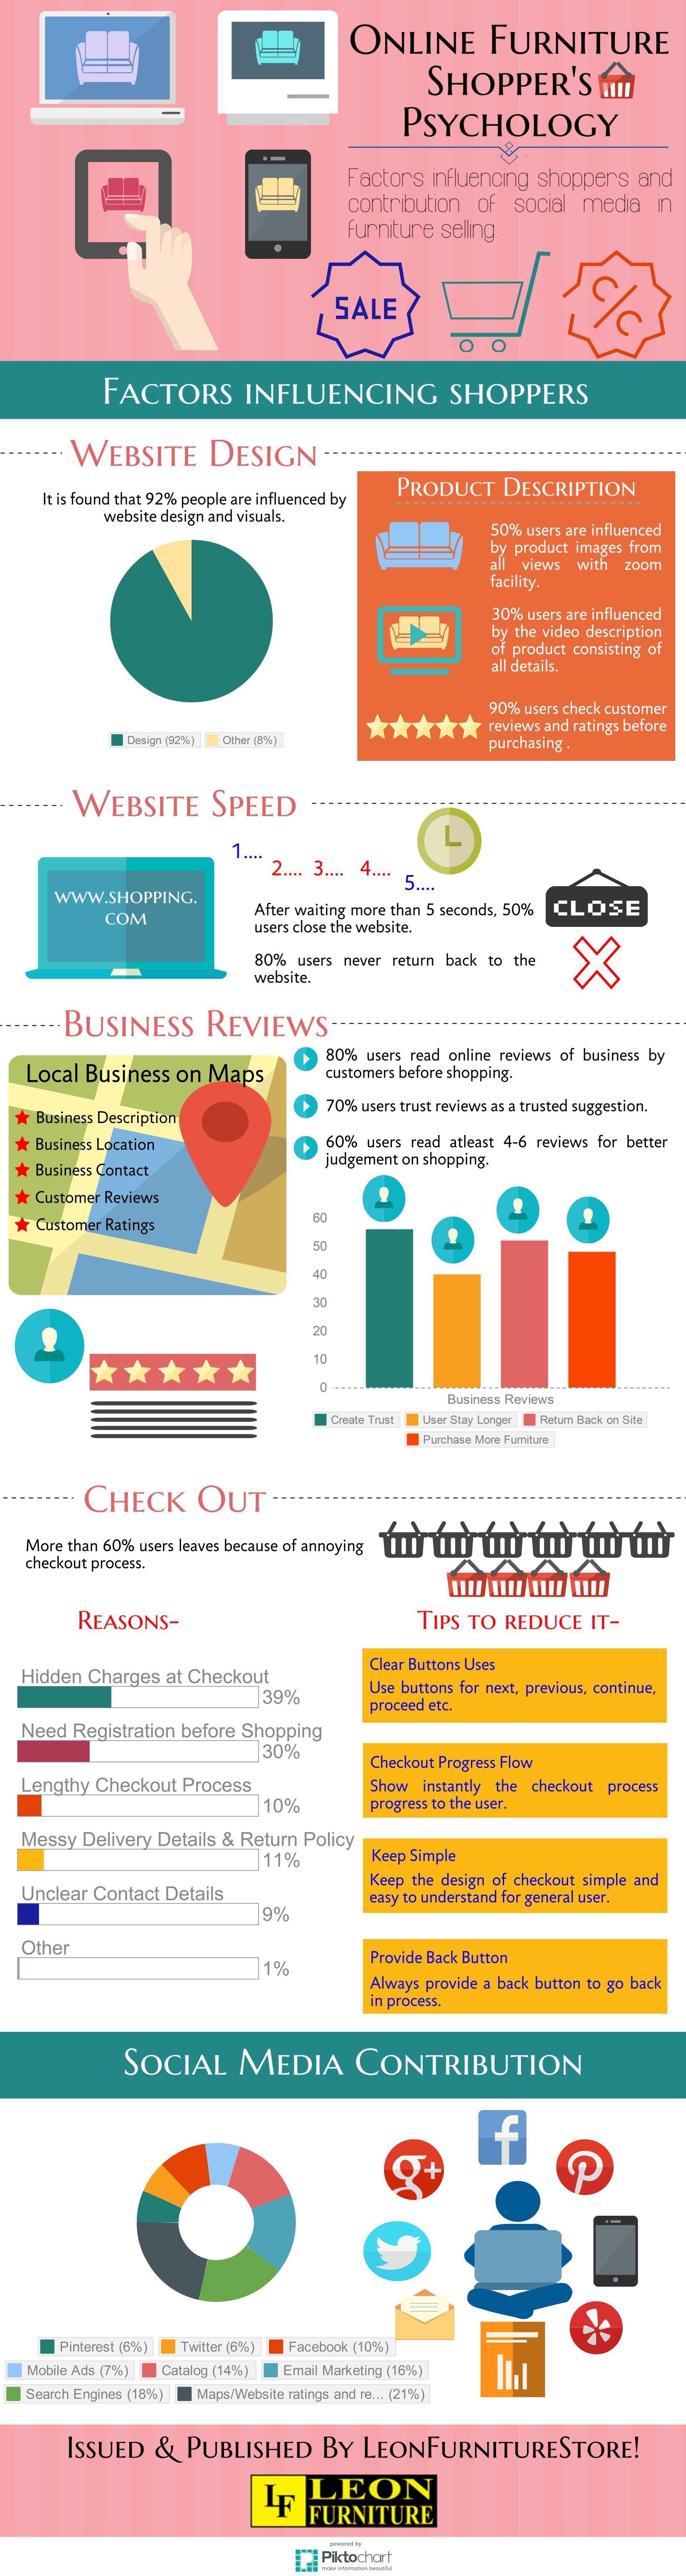 Online Furniture Shopper S Psychology Infographic Social Media